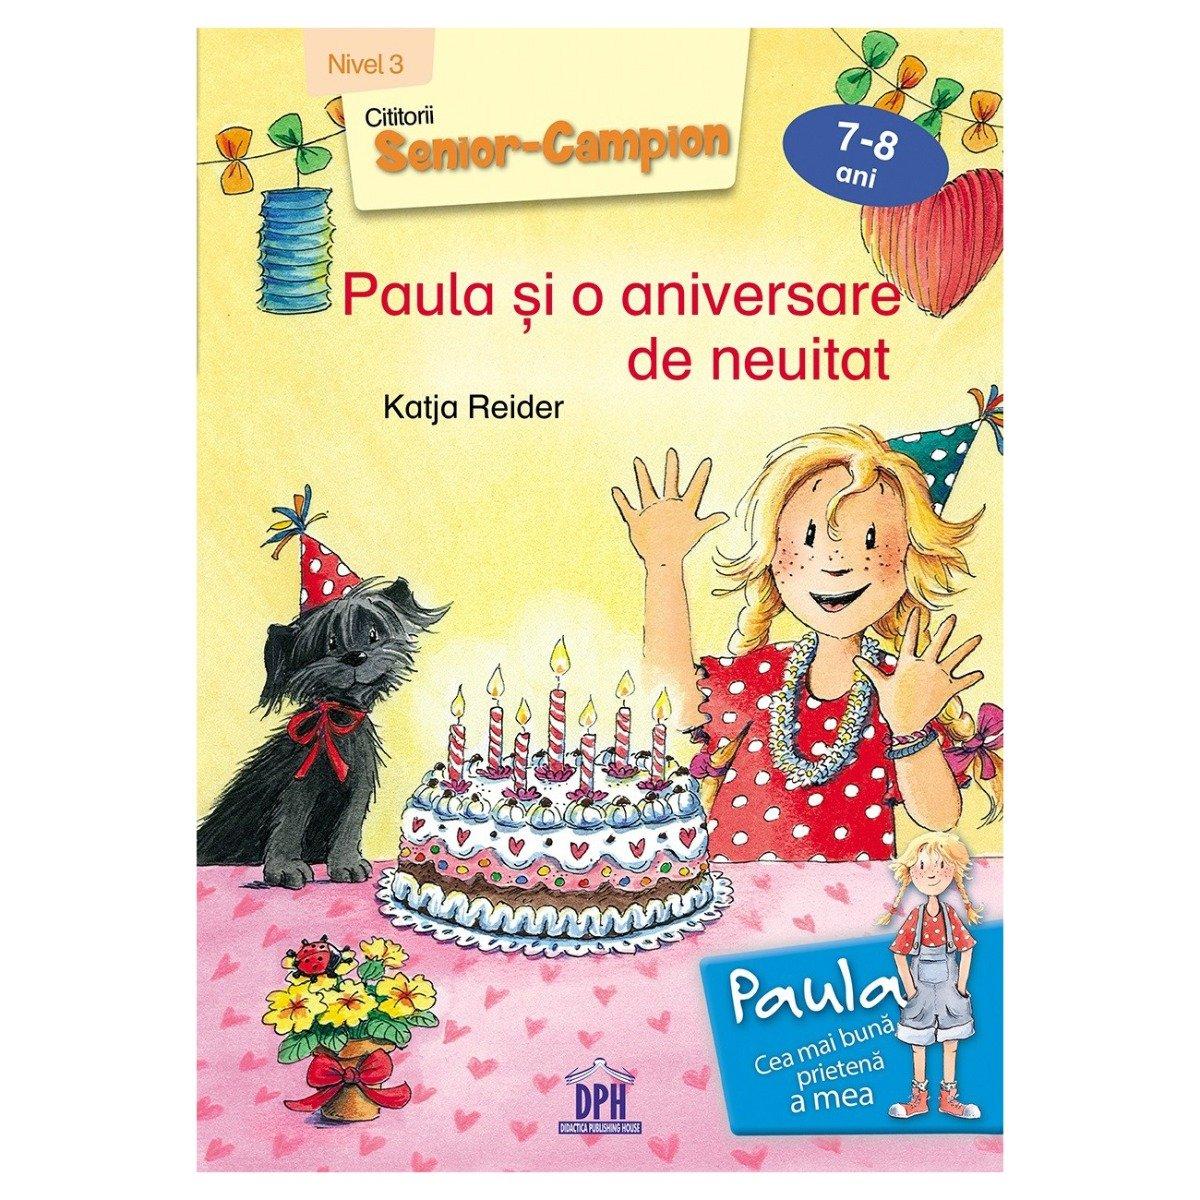 Carte Paula si o aniversare de neuitat - nivel 3, Editura DPH imagine 2021